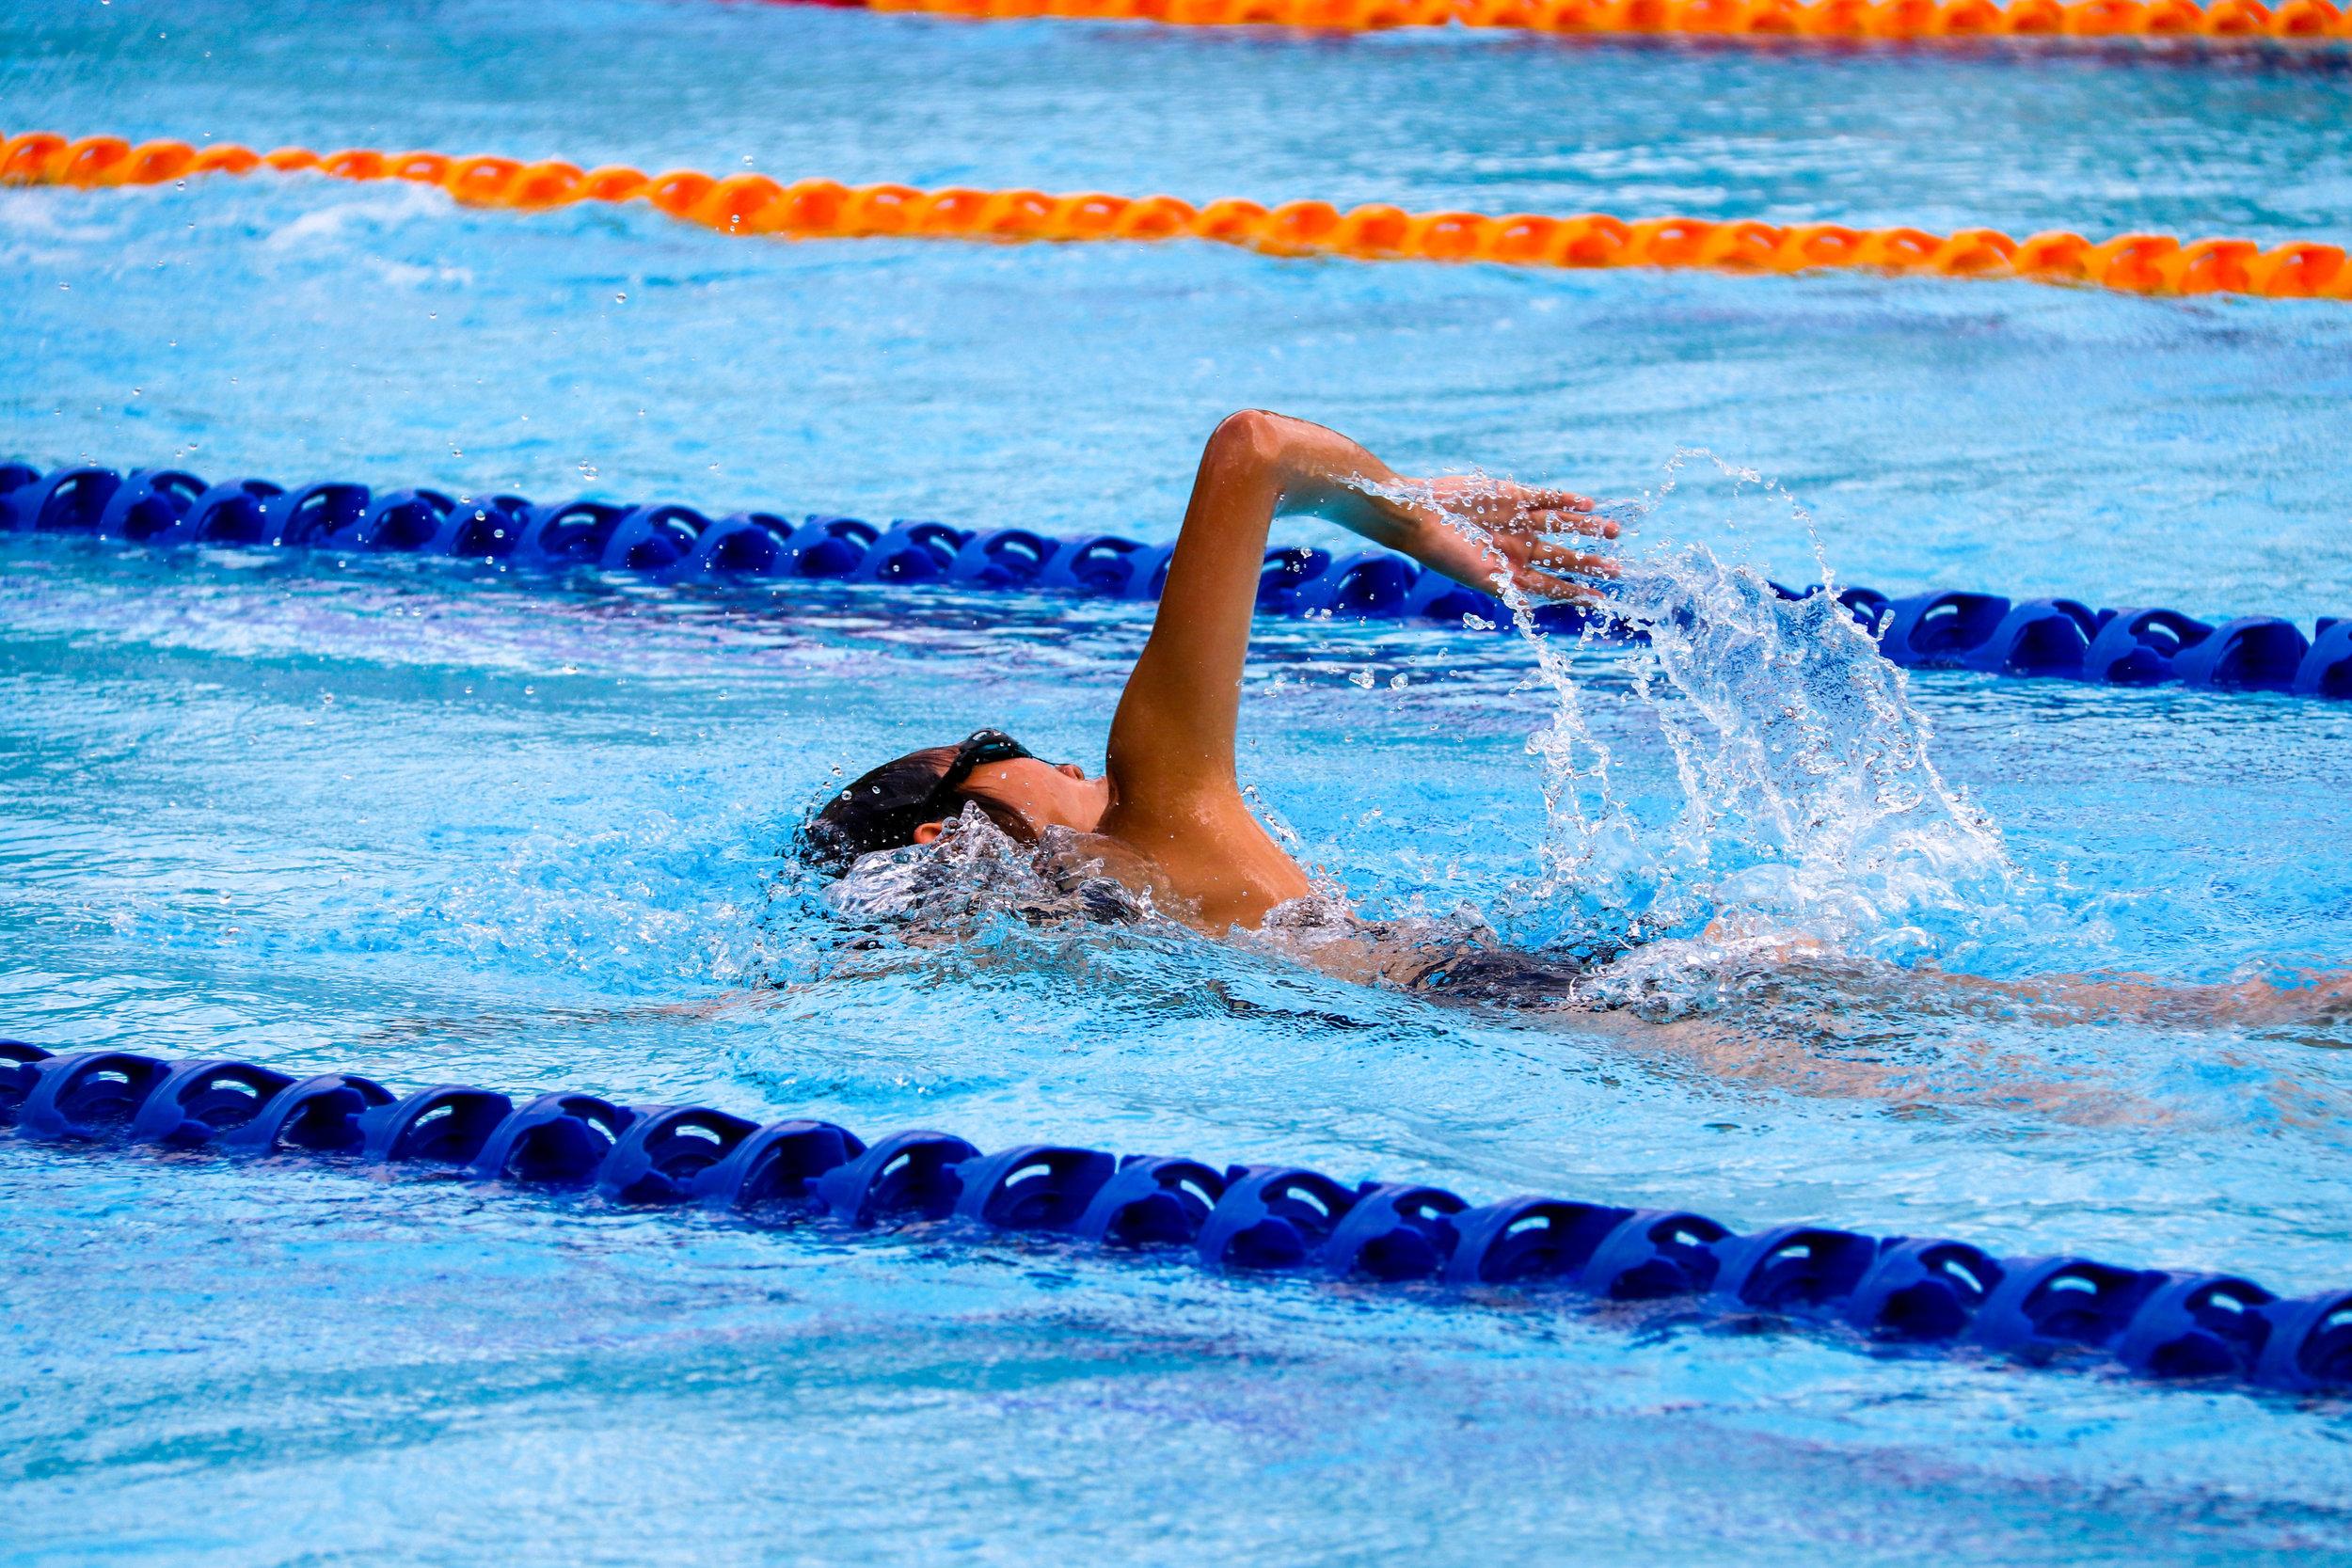 Swimming (crawl) = Vigorous Intensity